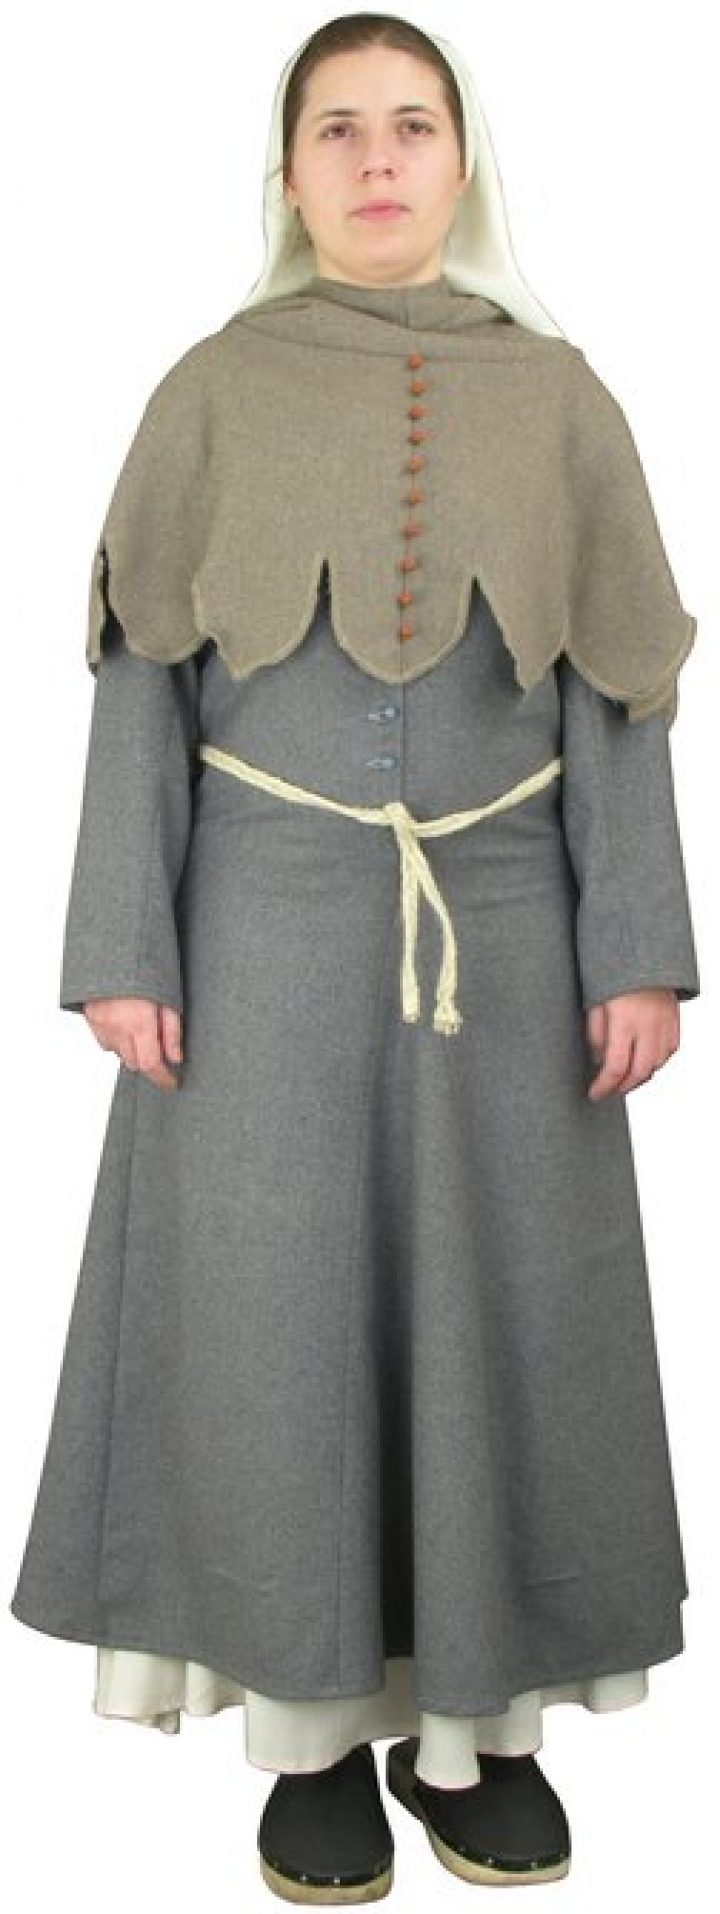 Middeleeuwse Jurk 15e eeuws